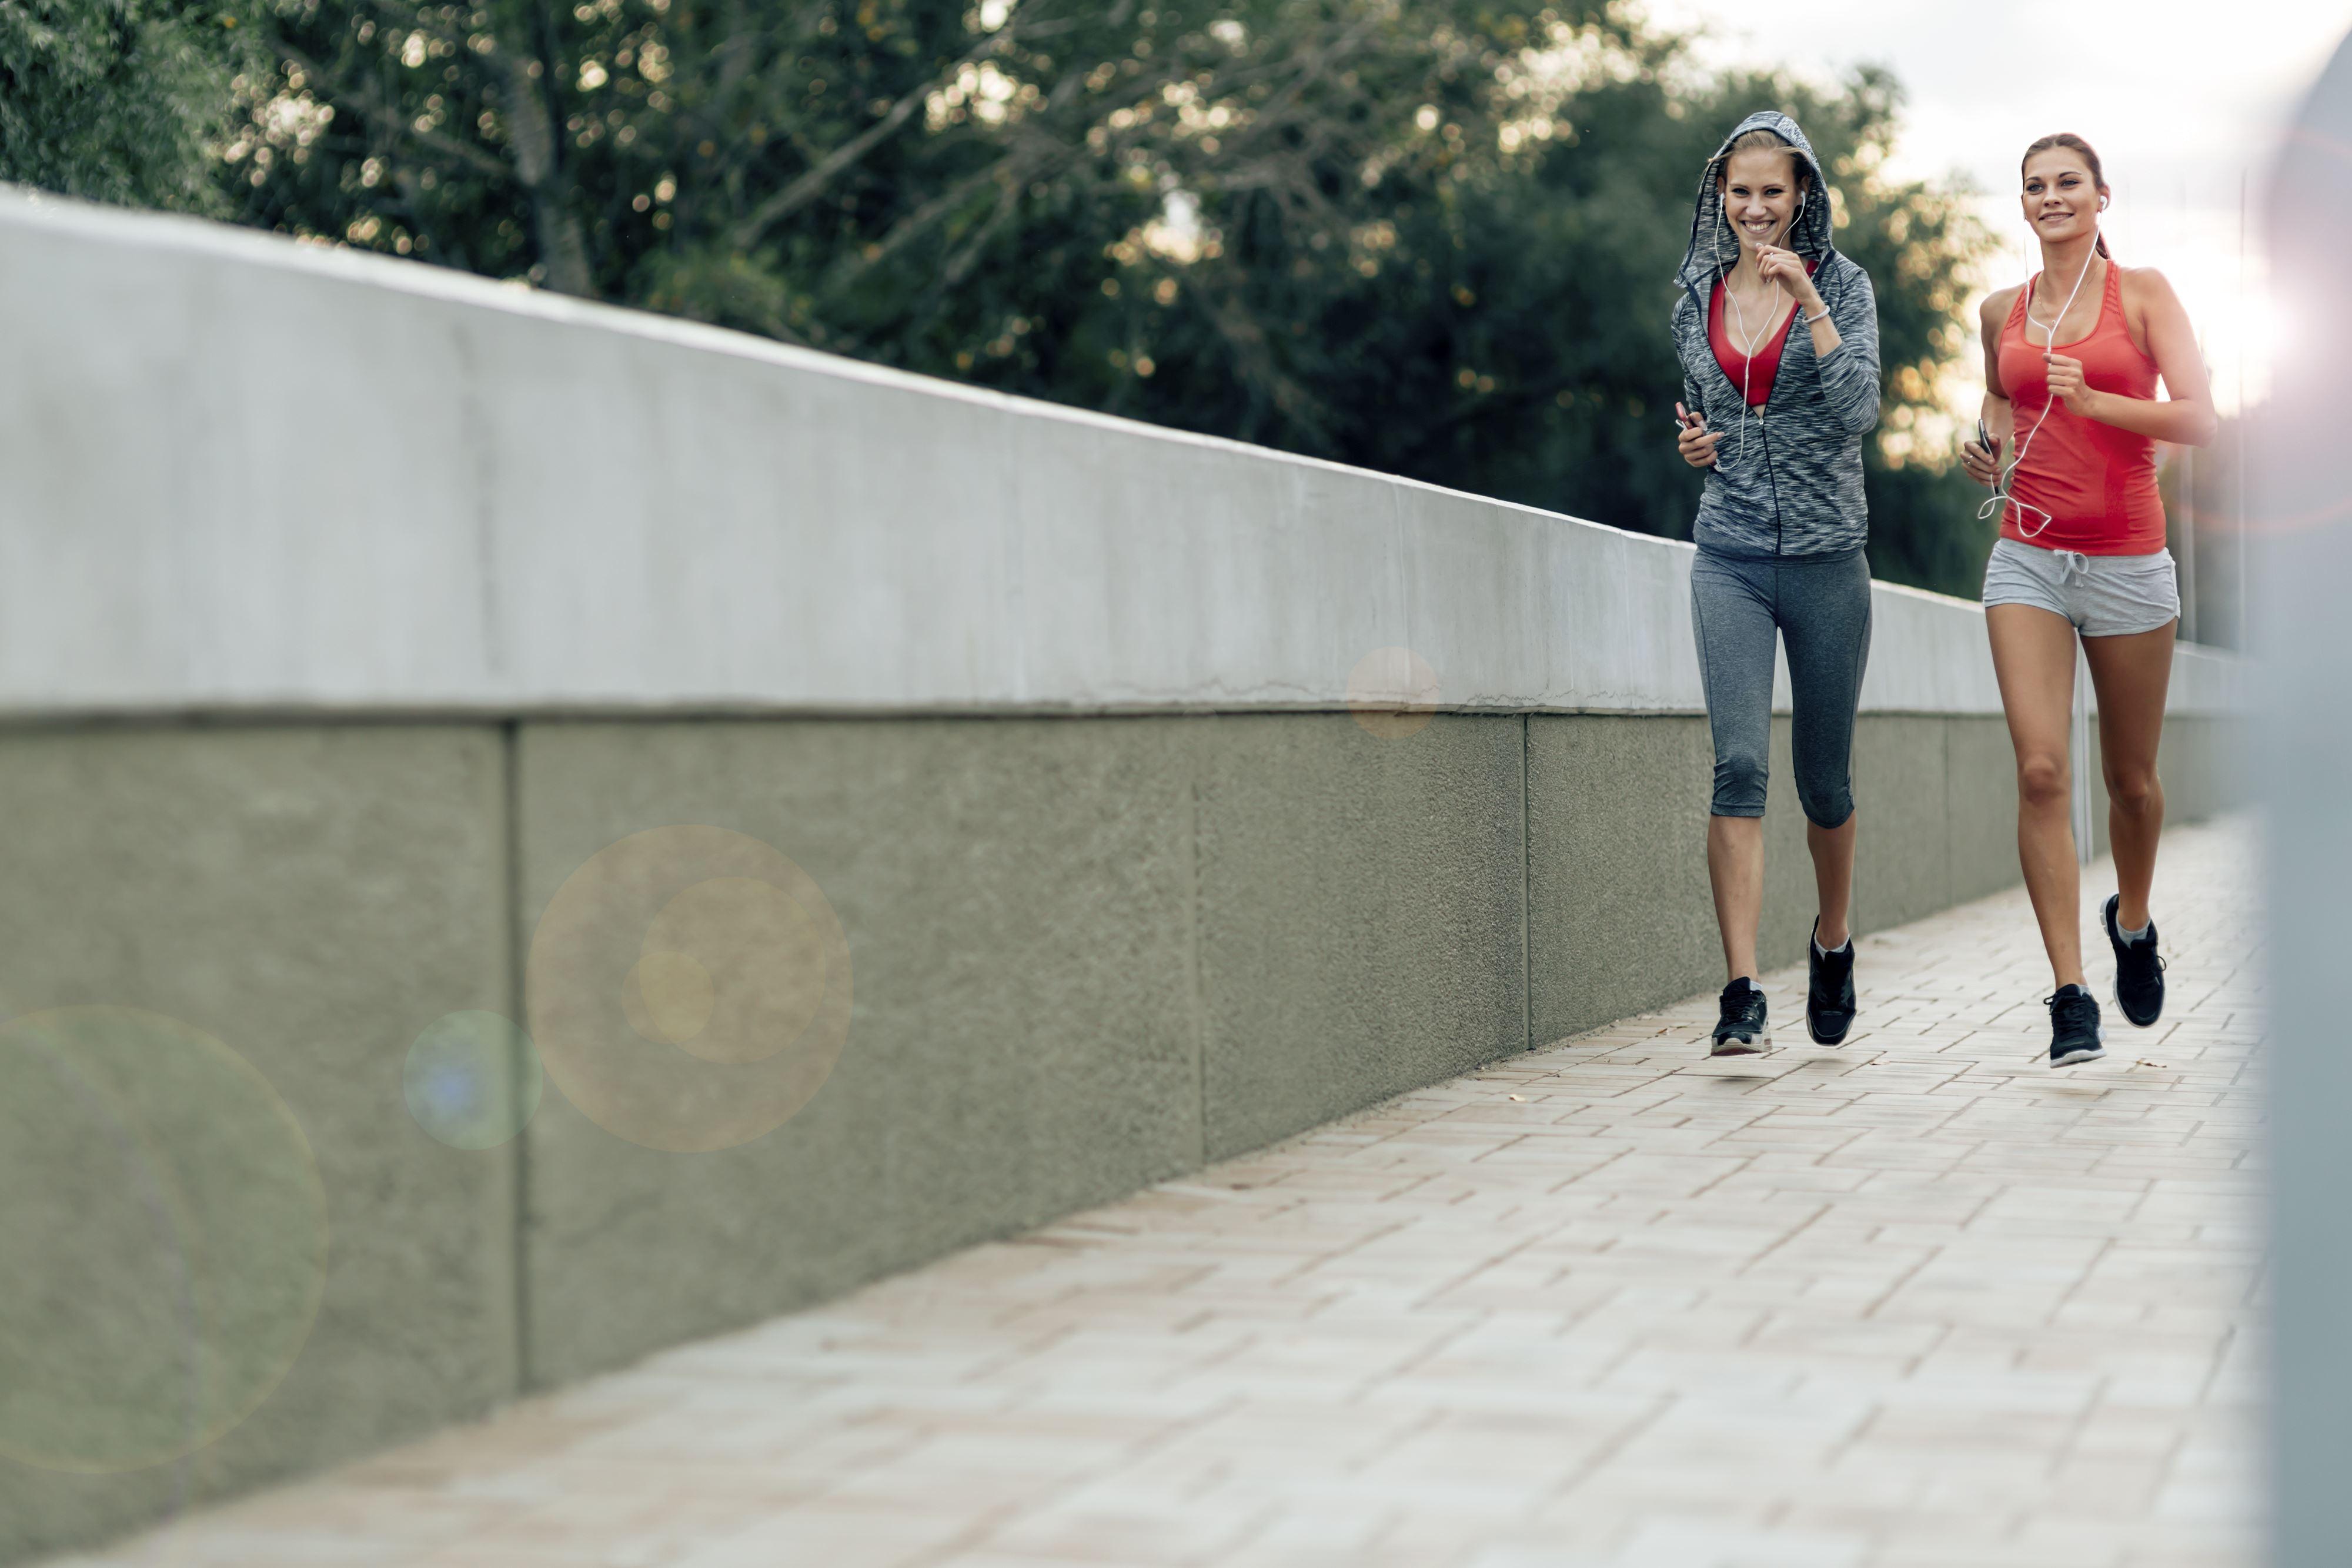 Women only marathons